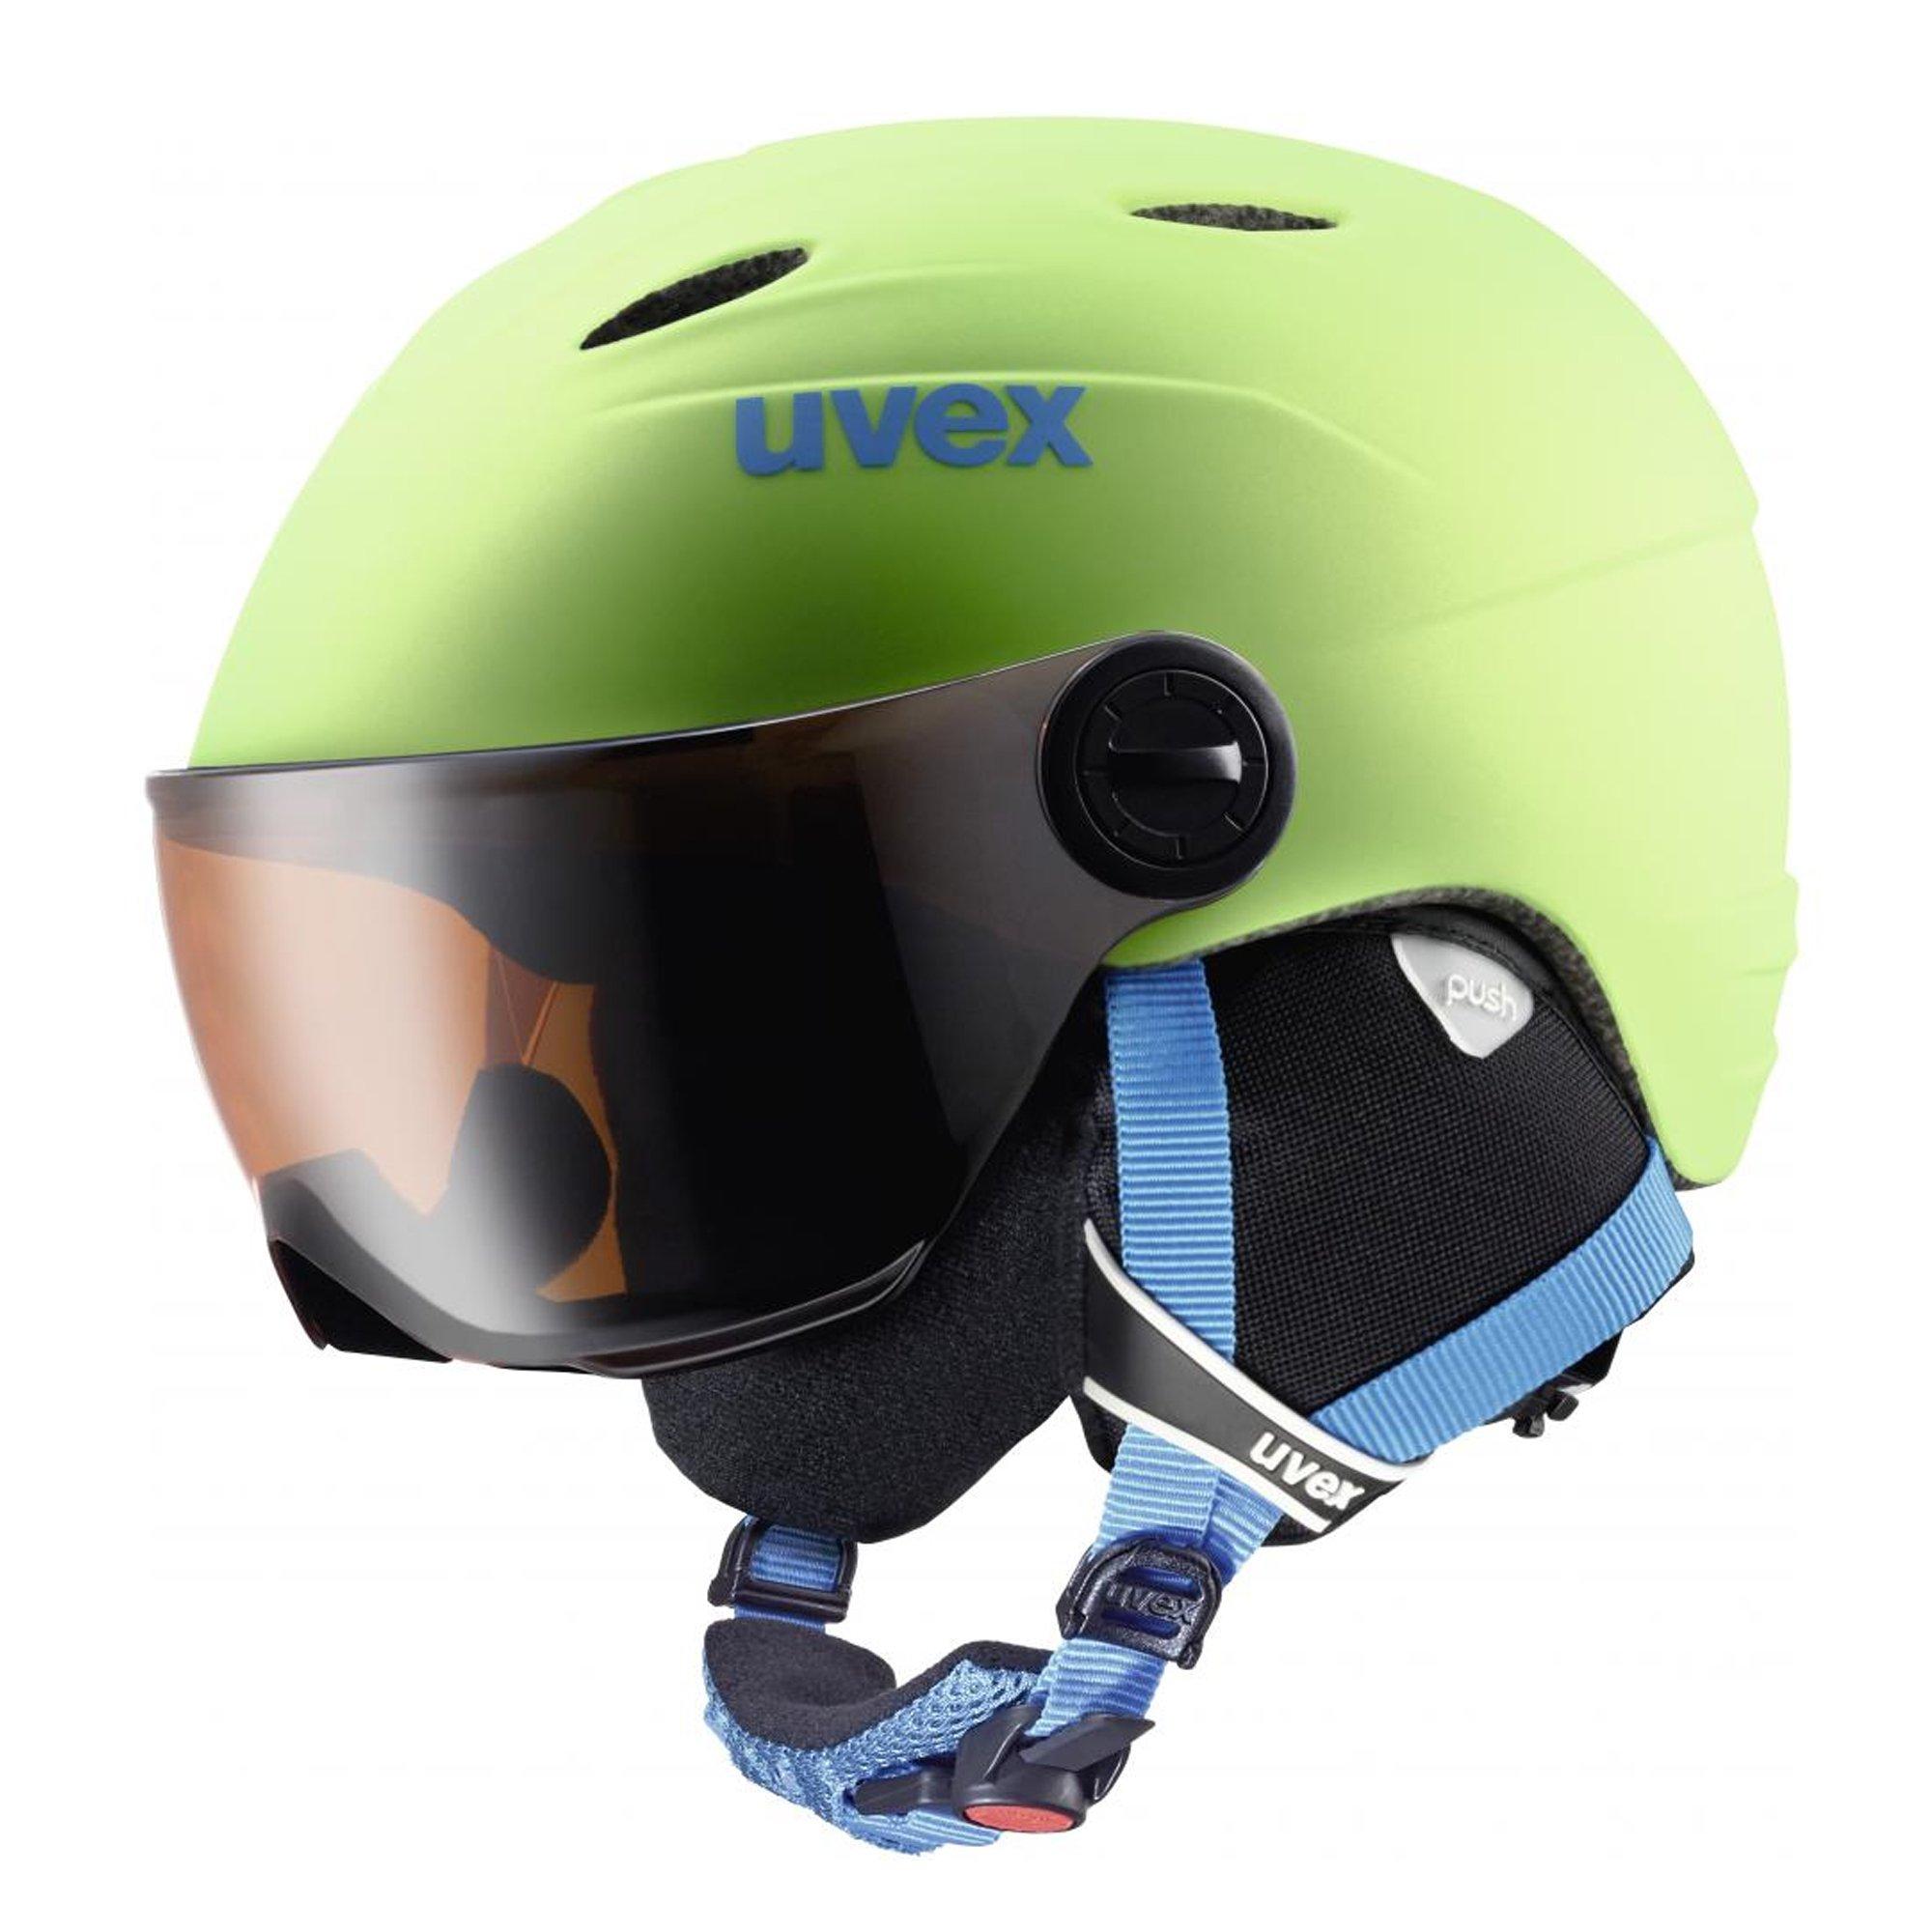 Uvex Visor Pro Jr Litegreen Mat 16/17